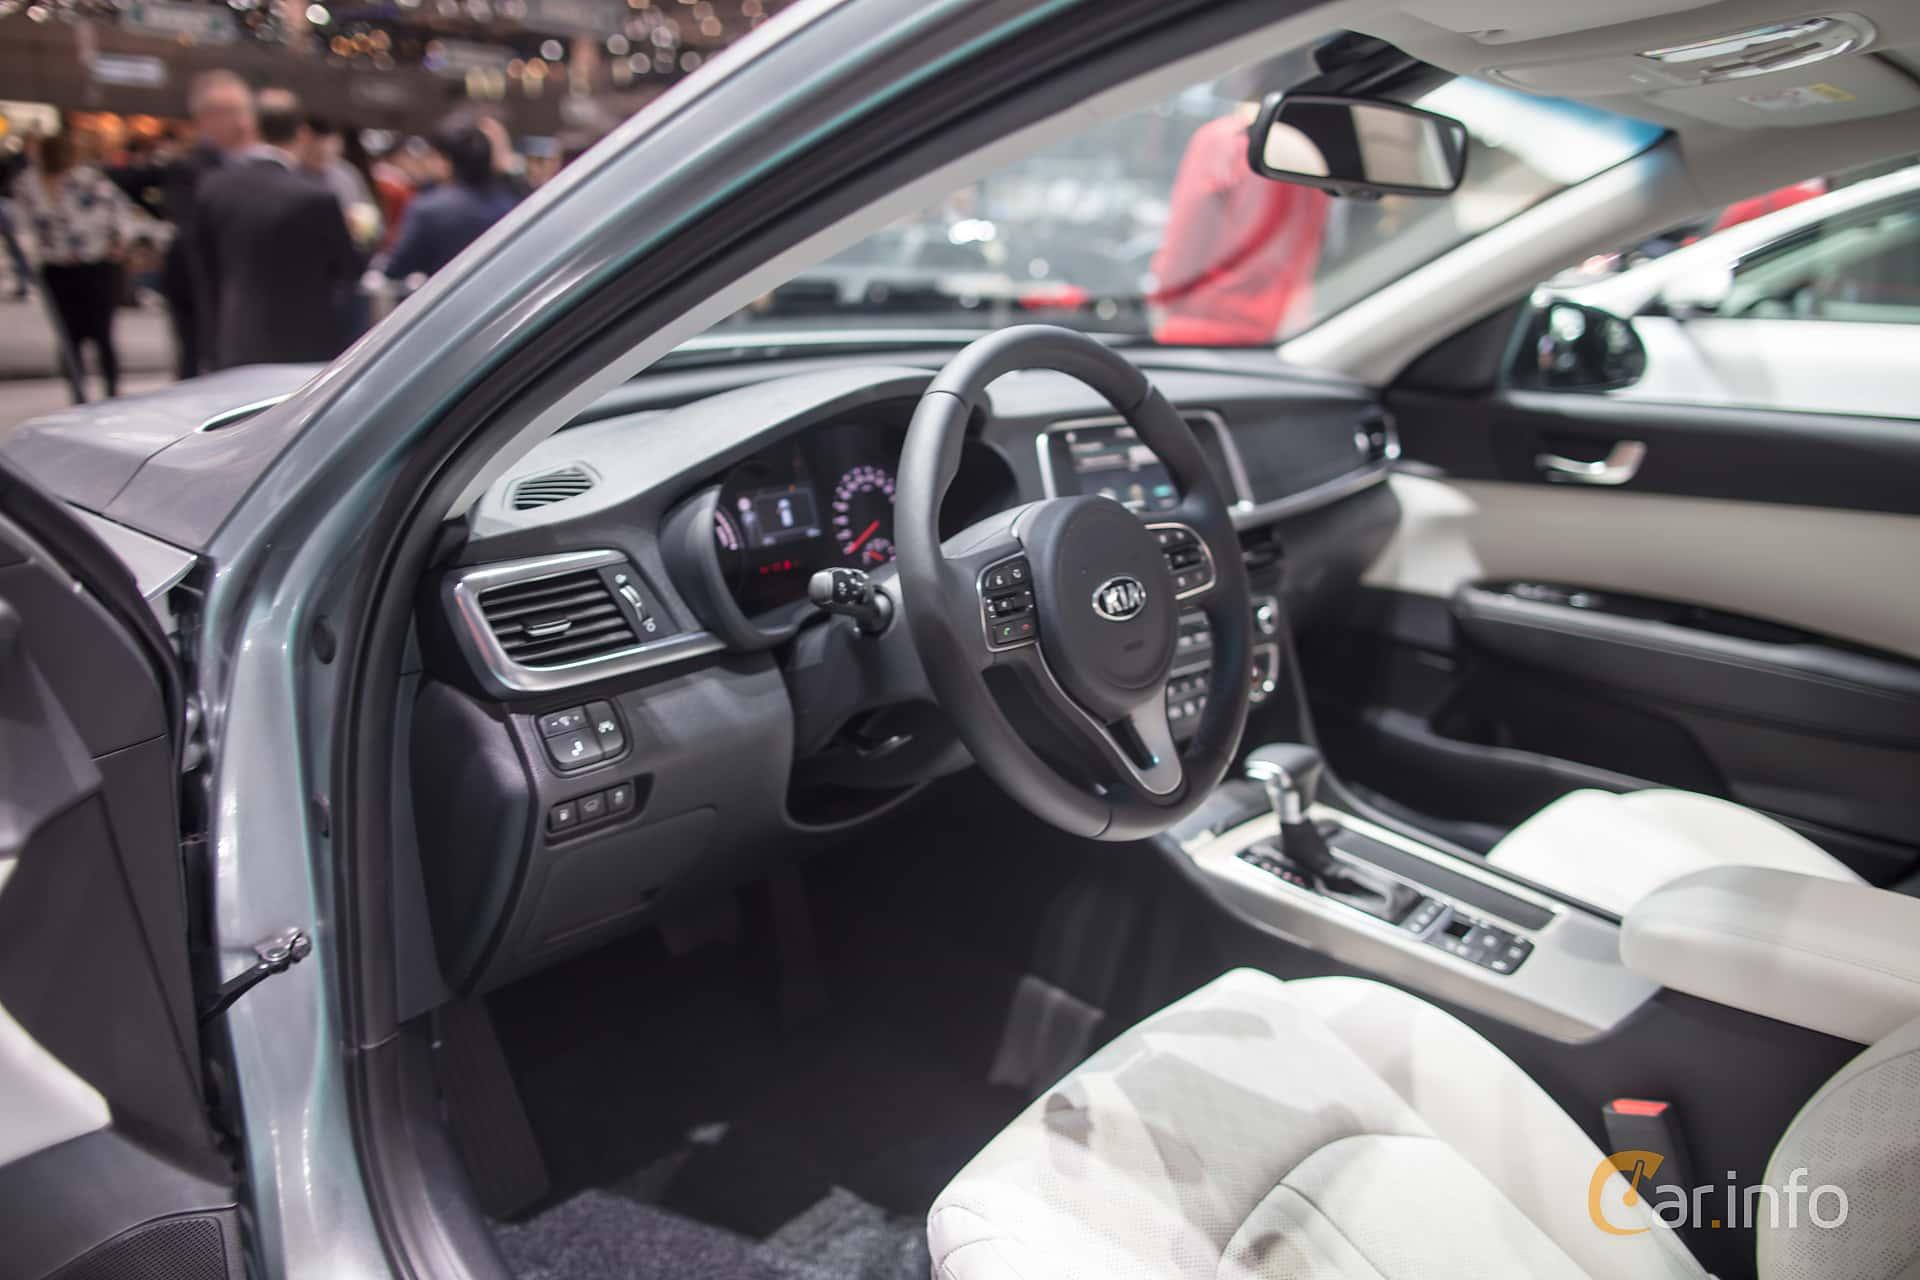 2018 kia optima sport. Beautiful Optima Kia Optima Sport Wagon Hybrid PHEV 20 Automatic 205hp 2018 At Inside Kia Optima Sport